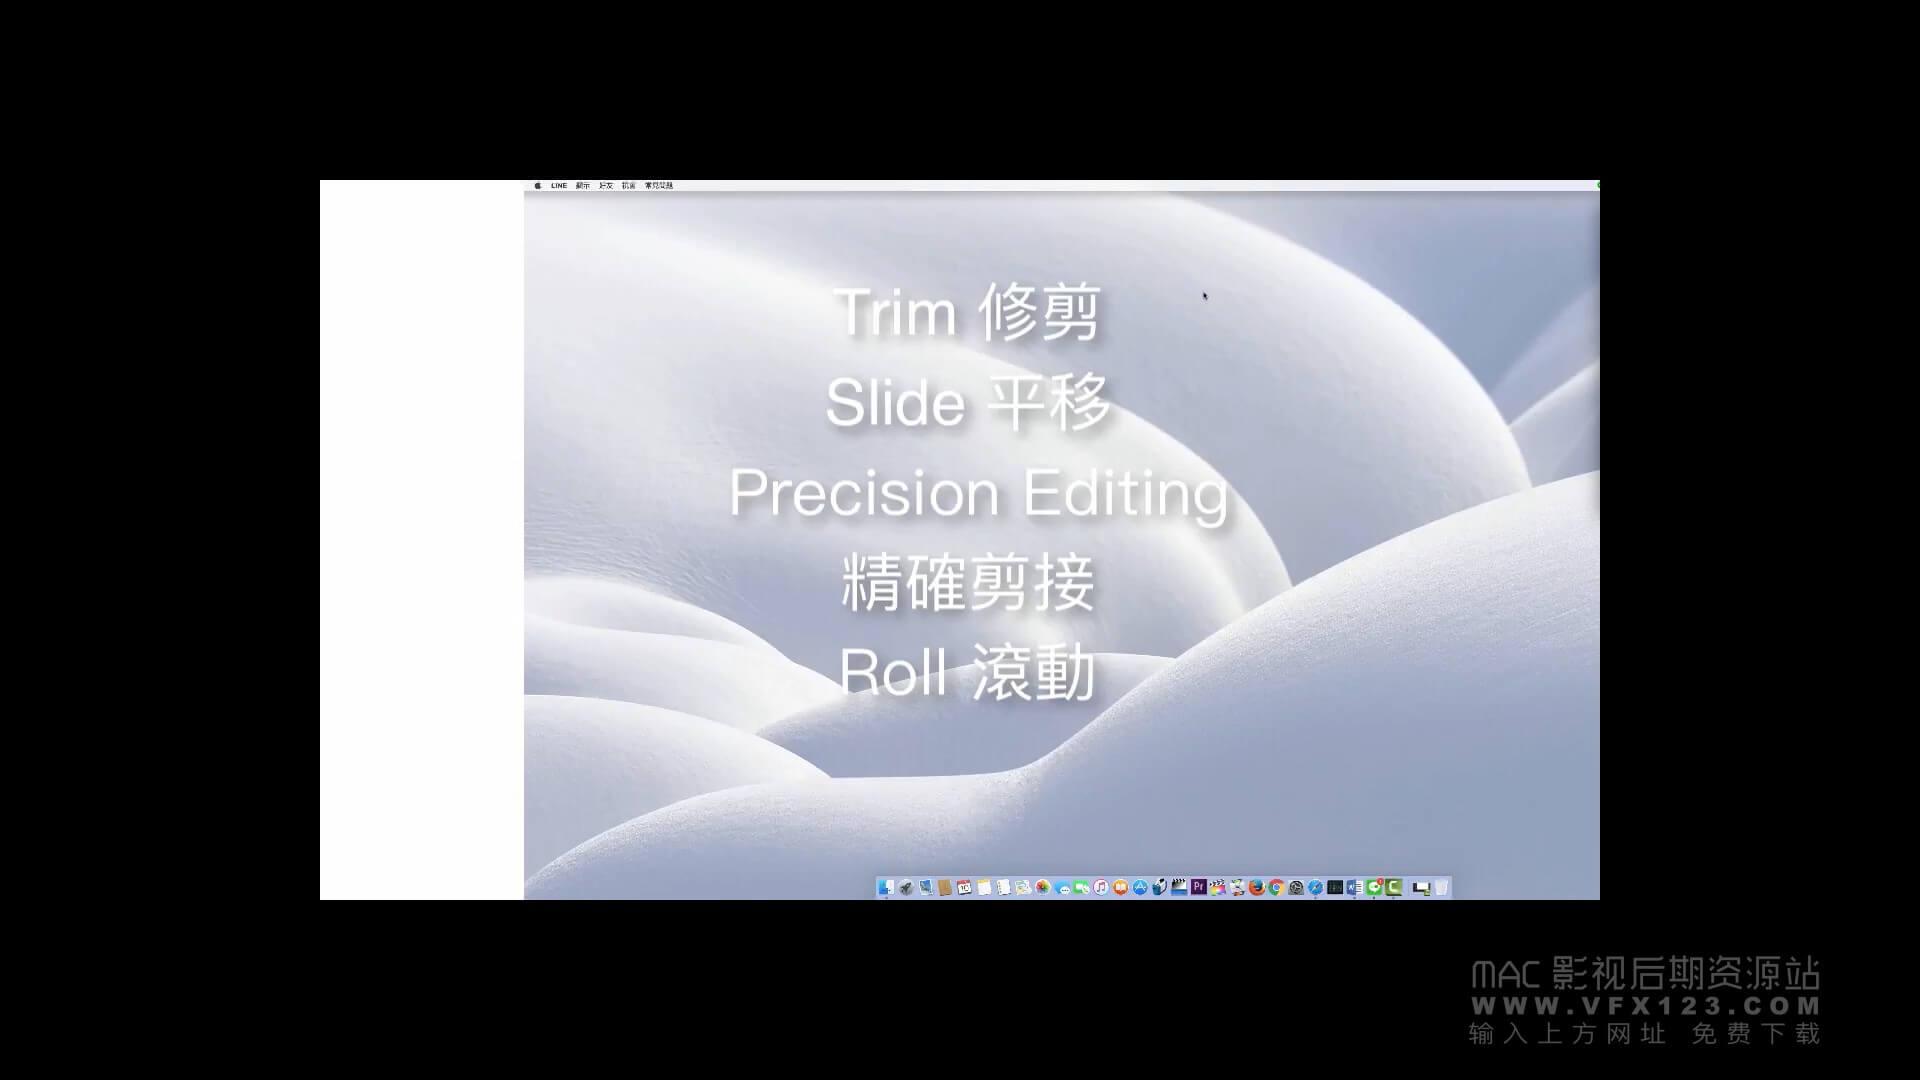 第8课: Final Cut Pro X 中Skimming.Trim.Slip.Slide.Rolld的用法